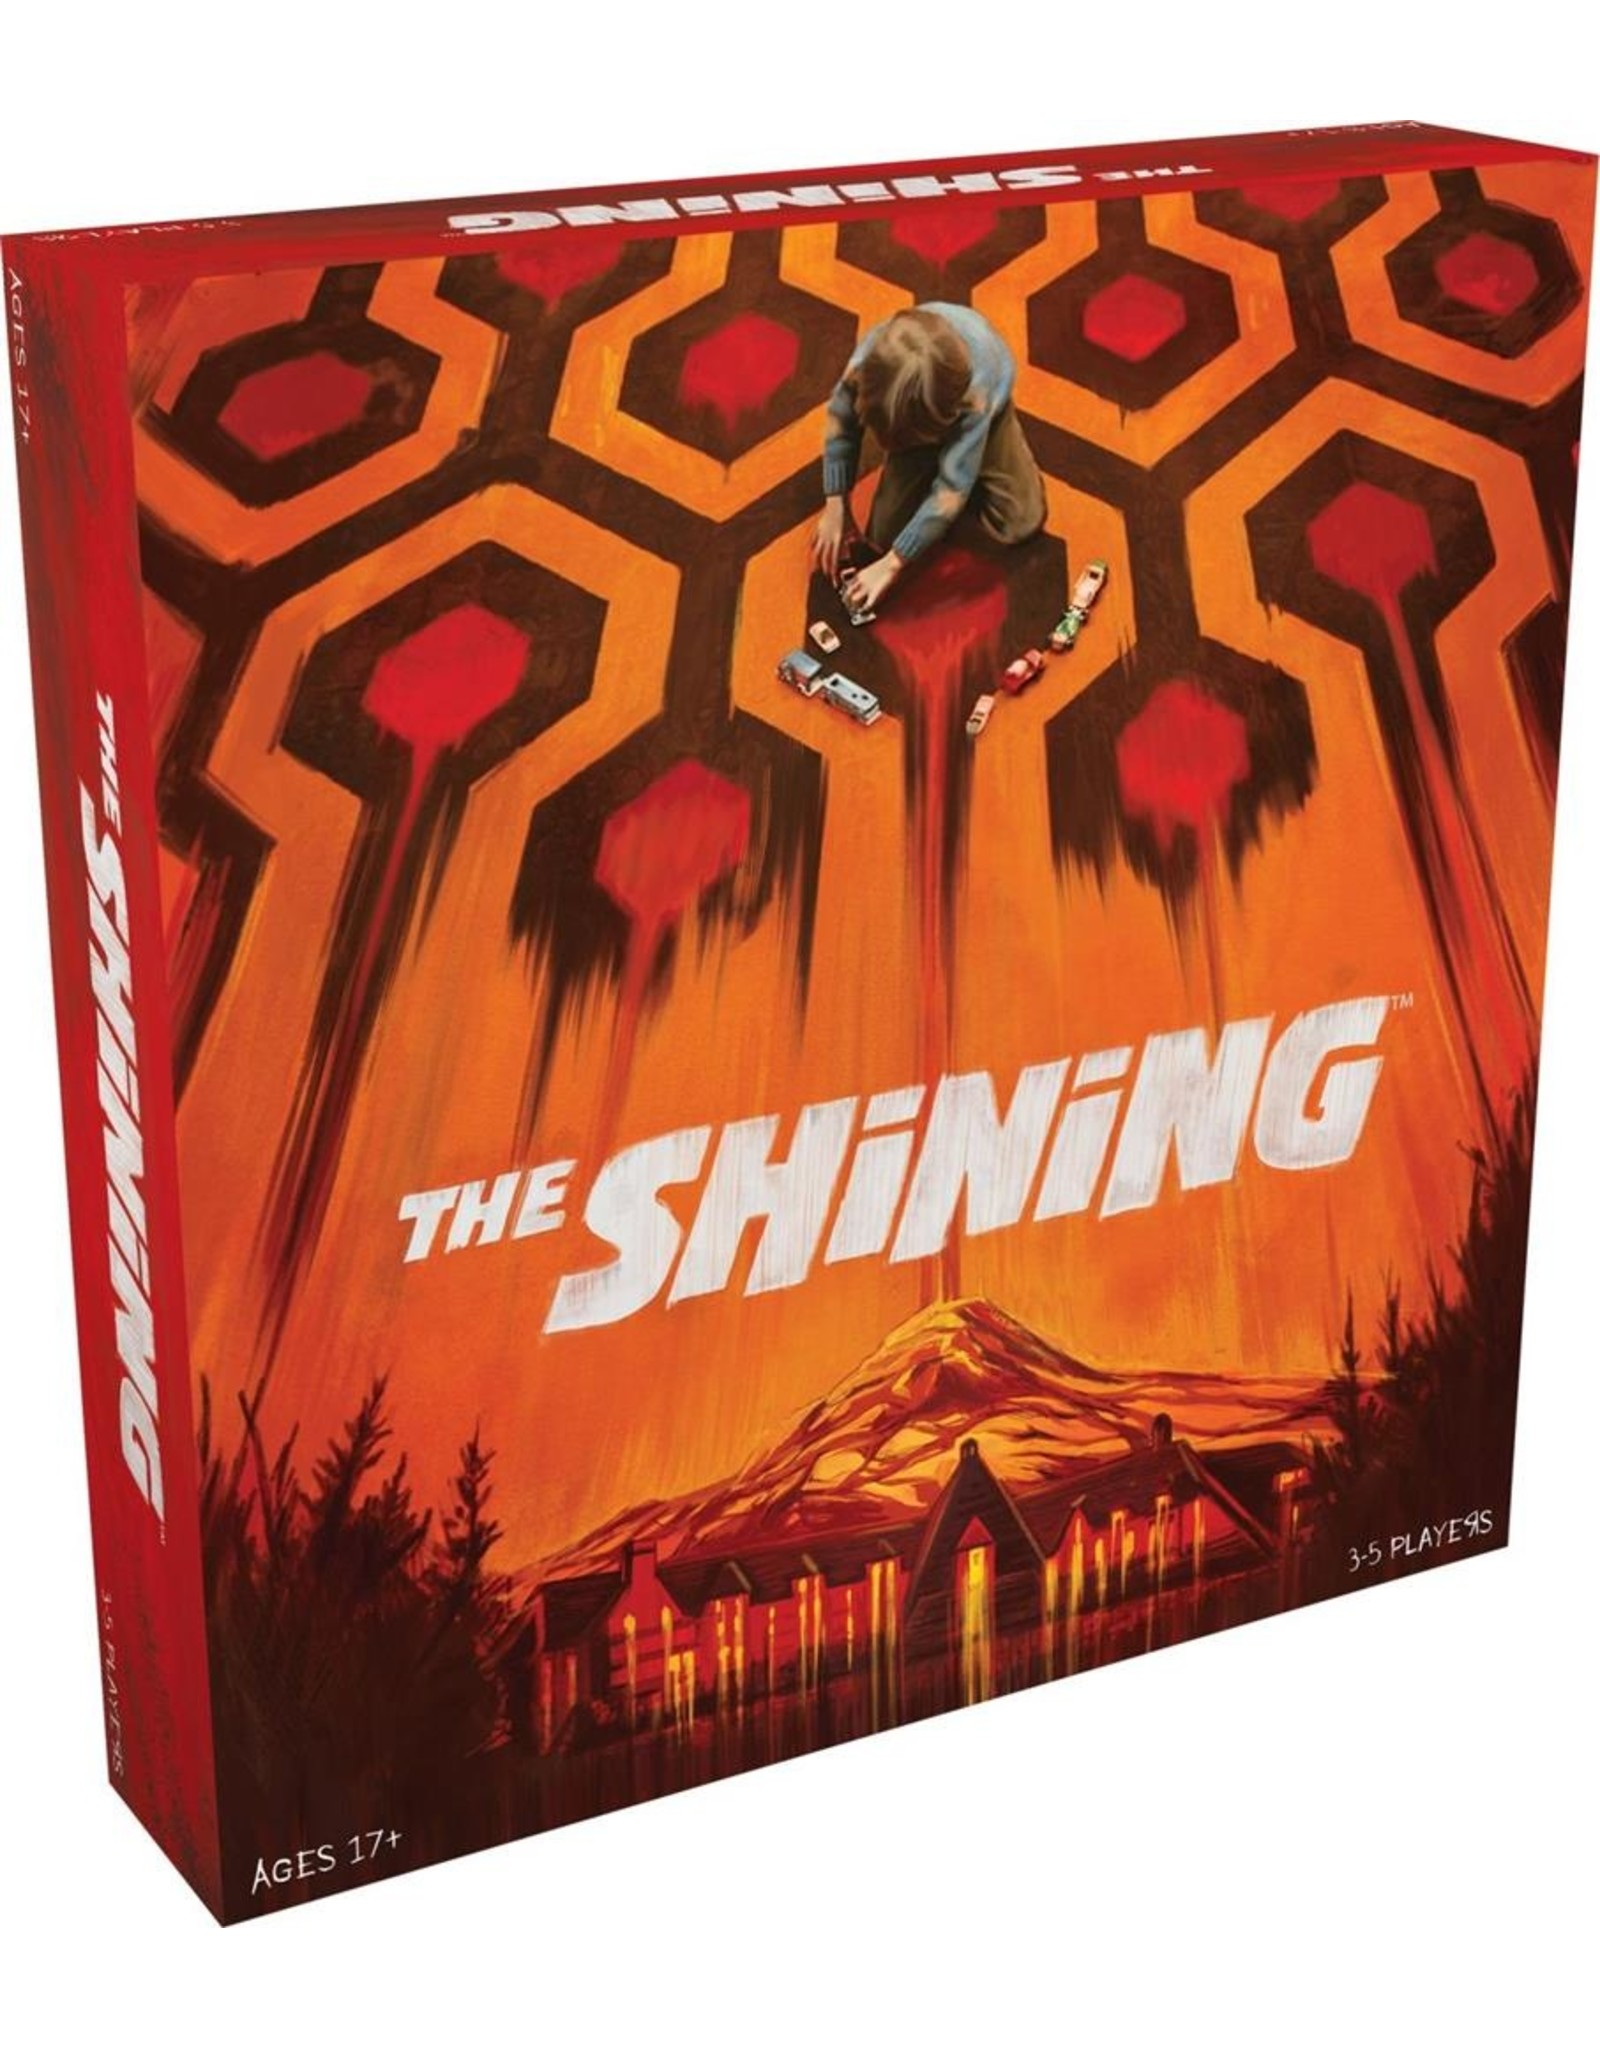 MIXLORE THE SHINING (ENGELS)